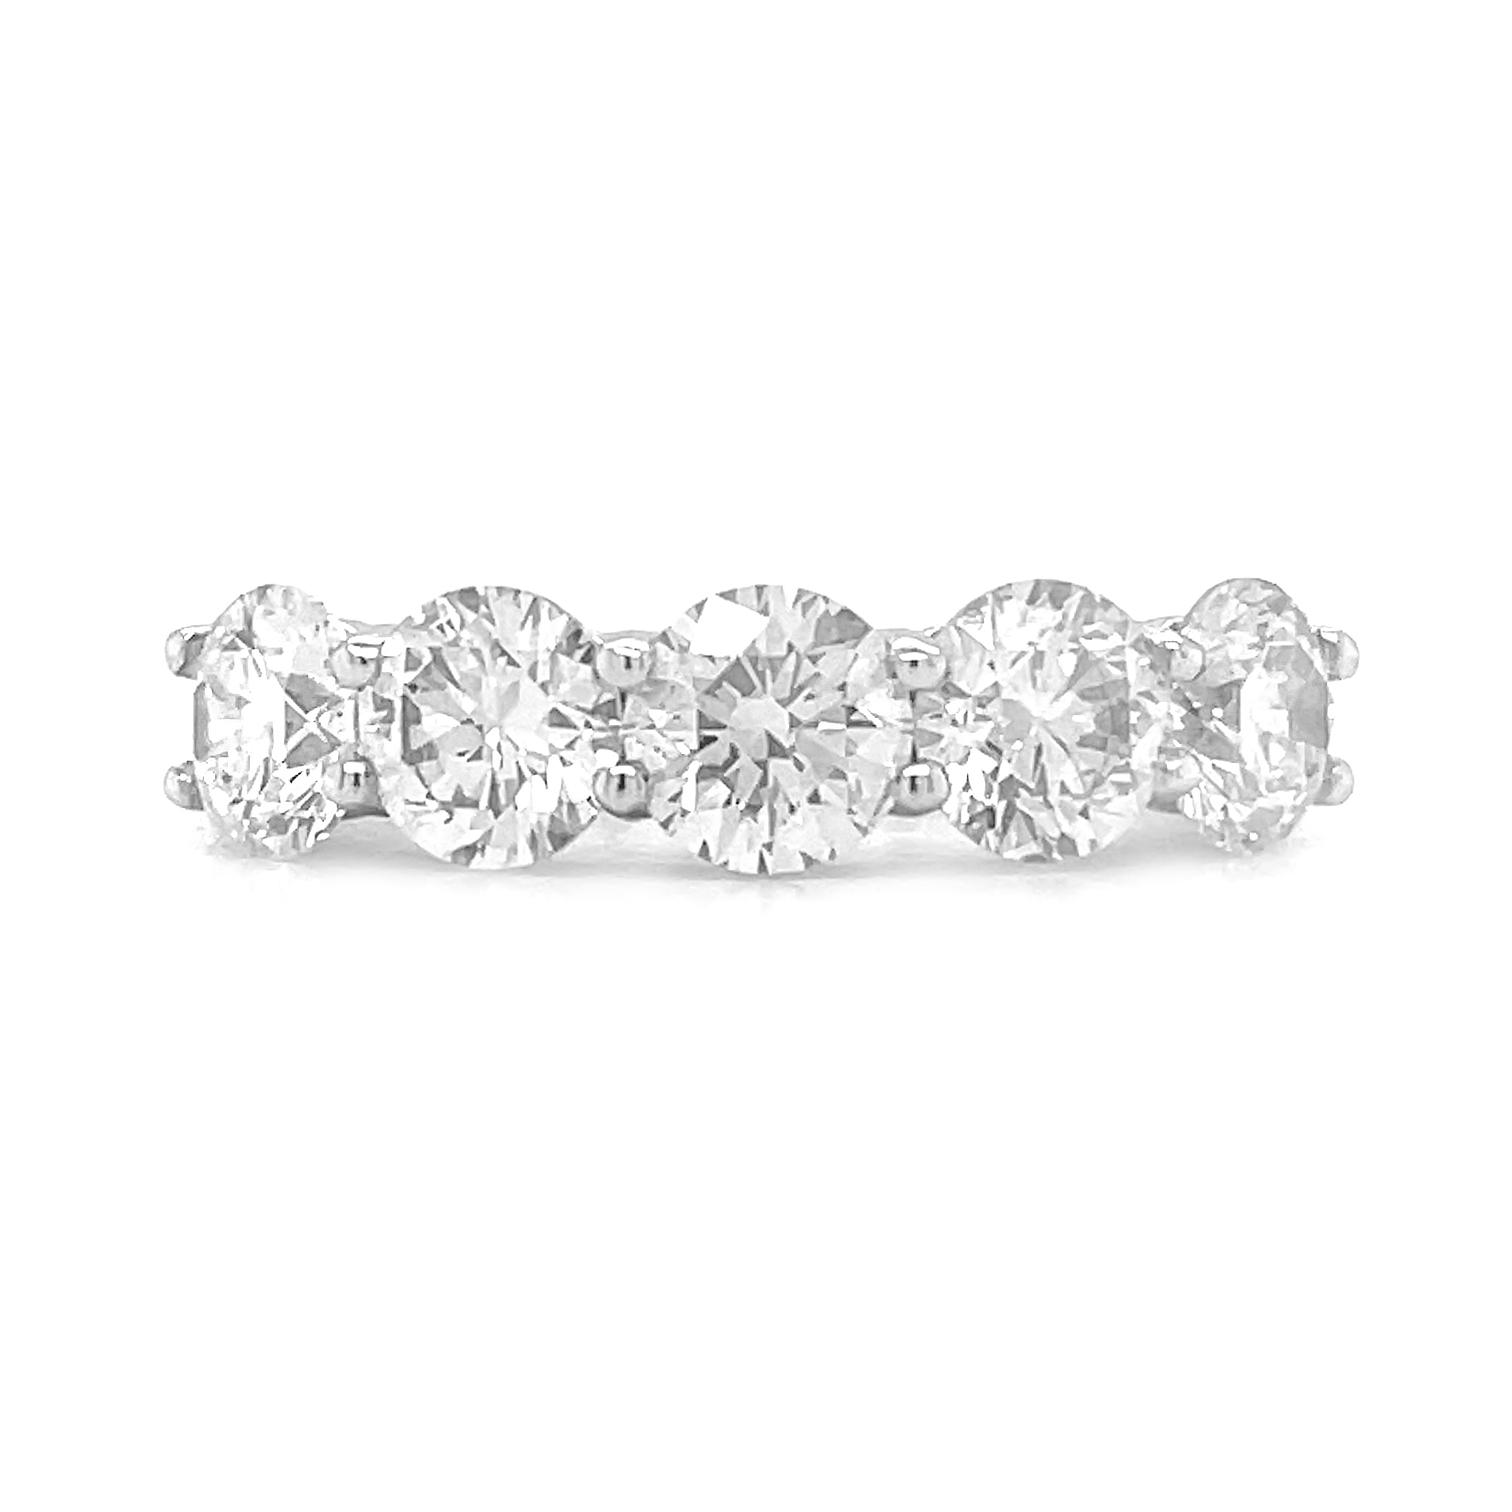 5 Stone Diamond Ring, Total Diamond Weight 2.53cts